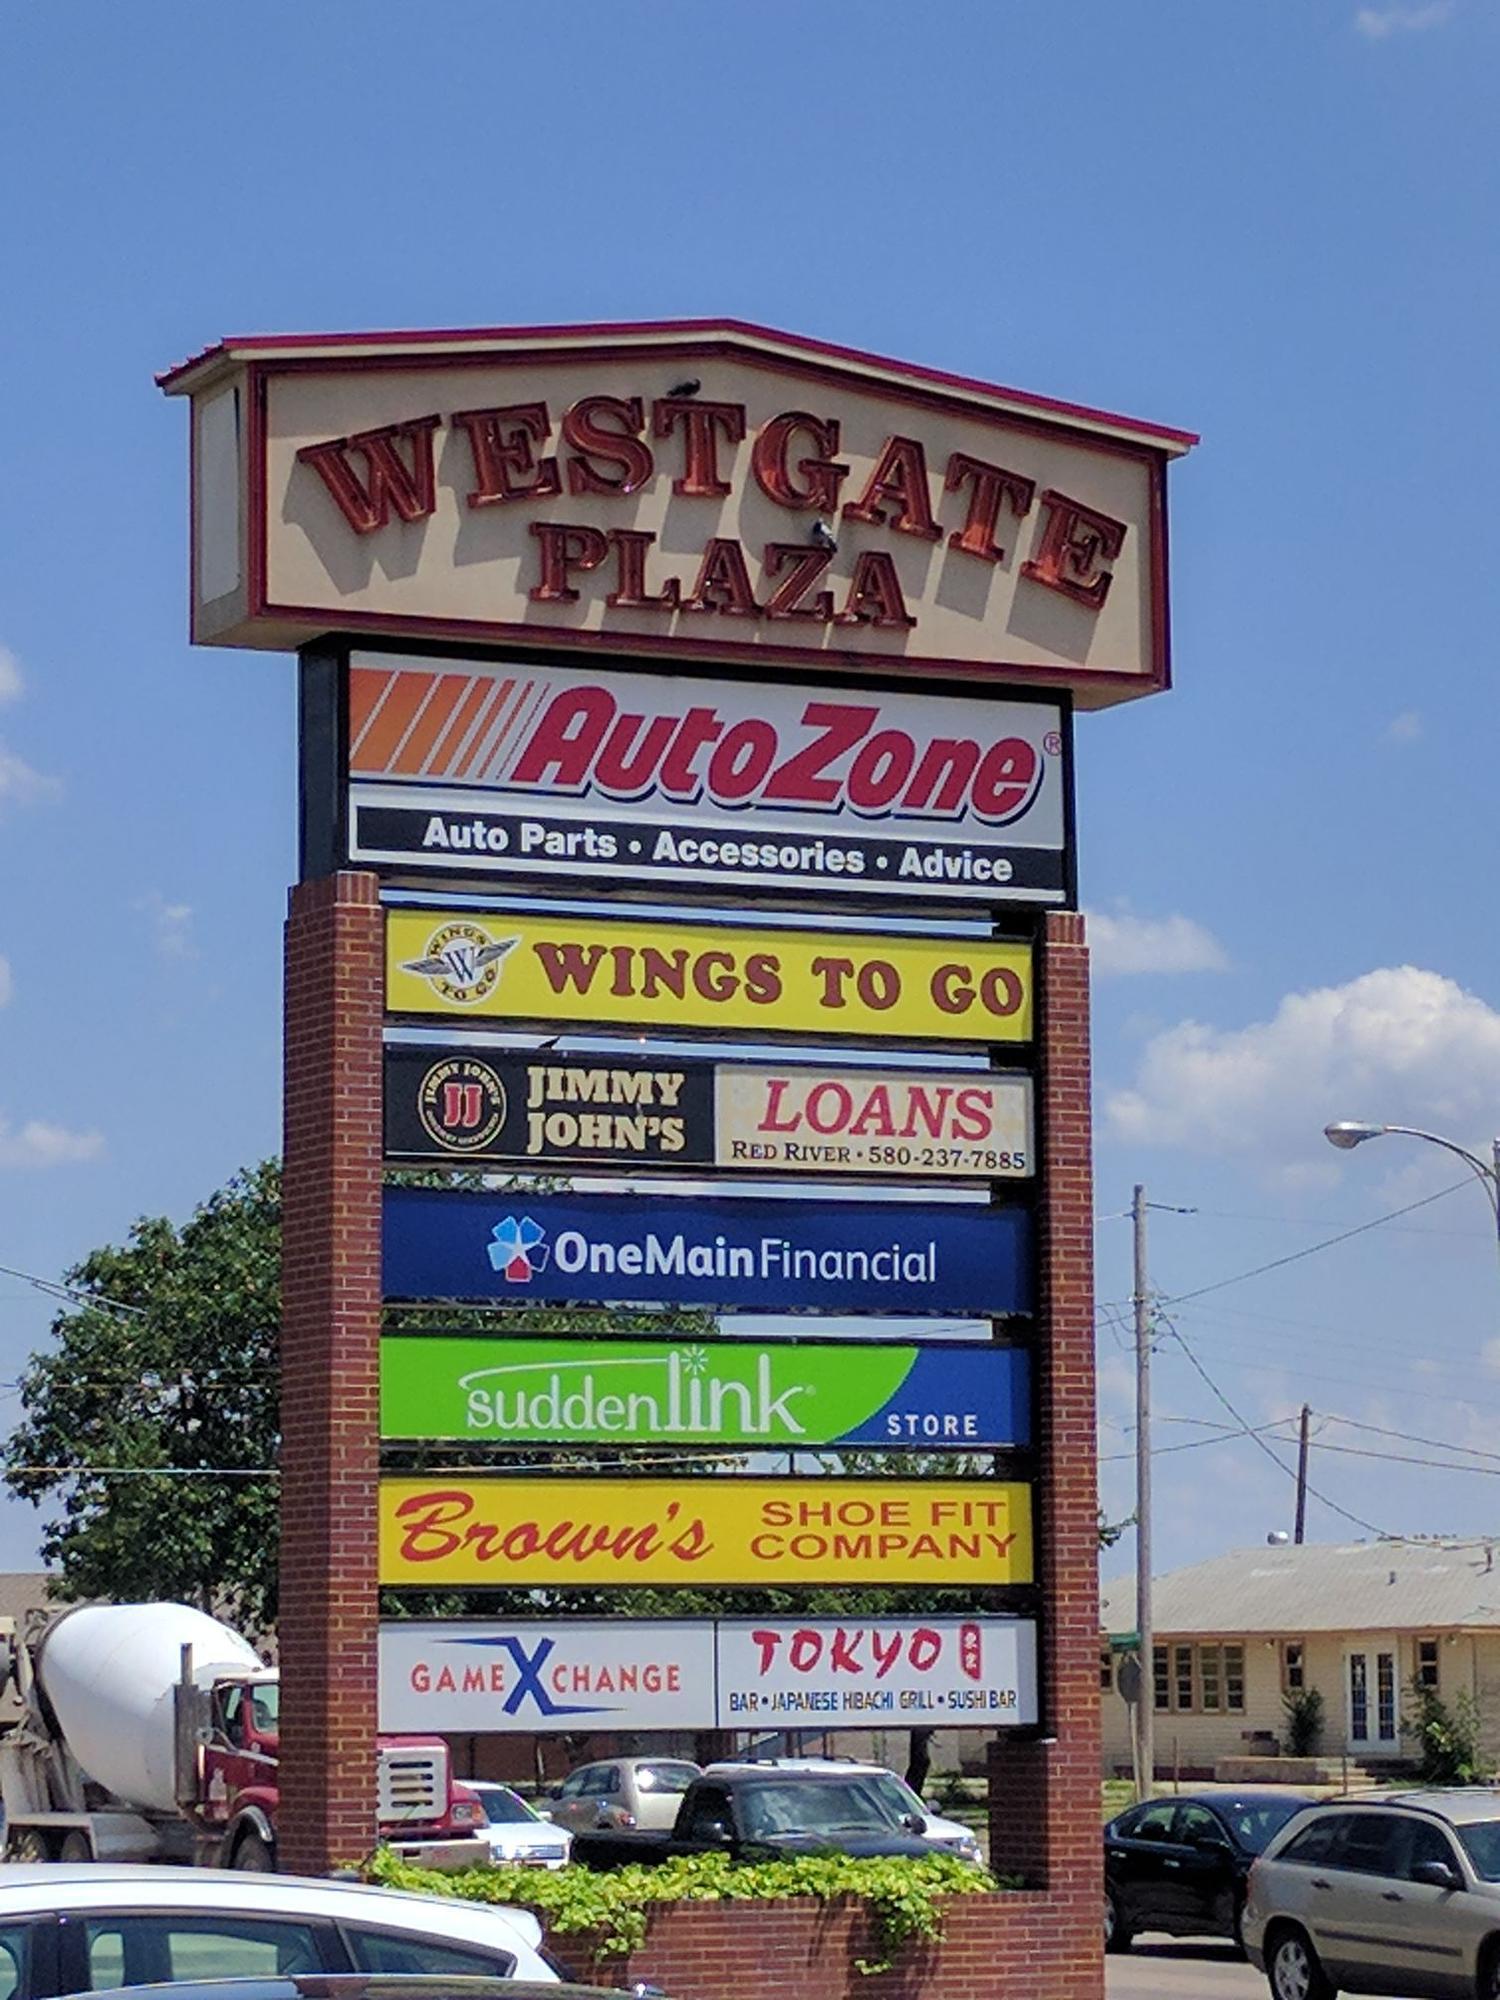 Westgate Plaza | PlugShare